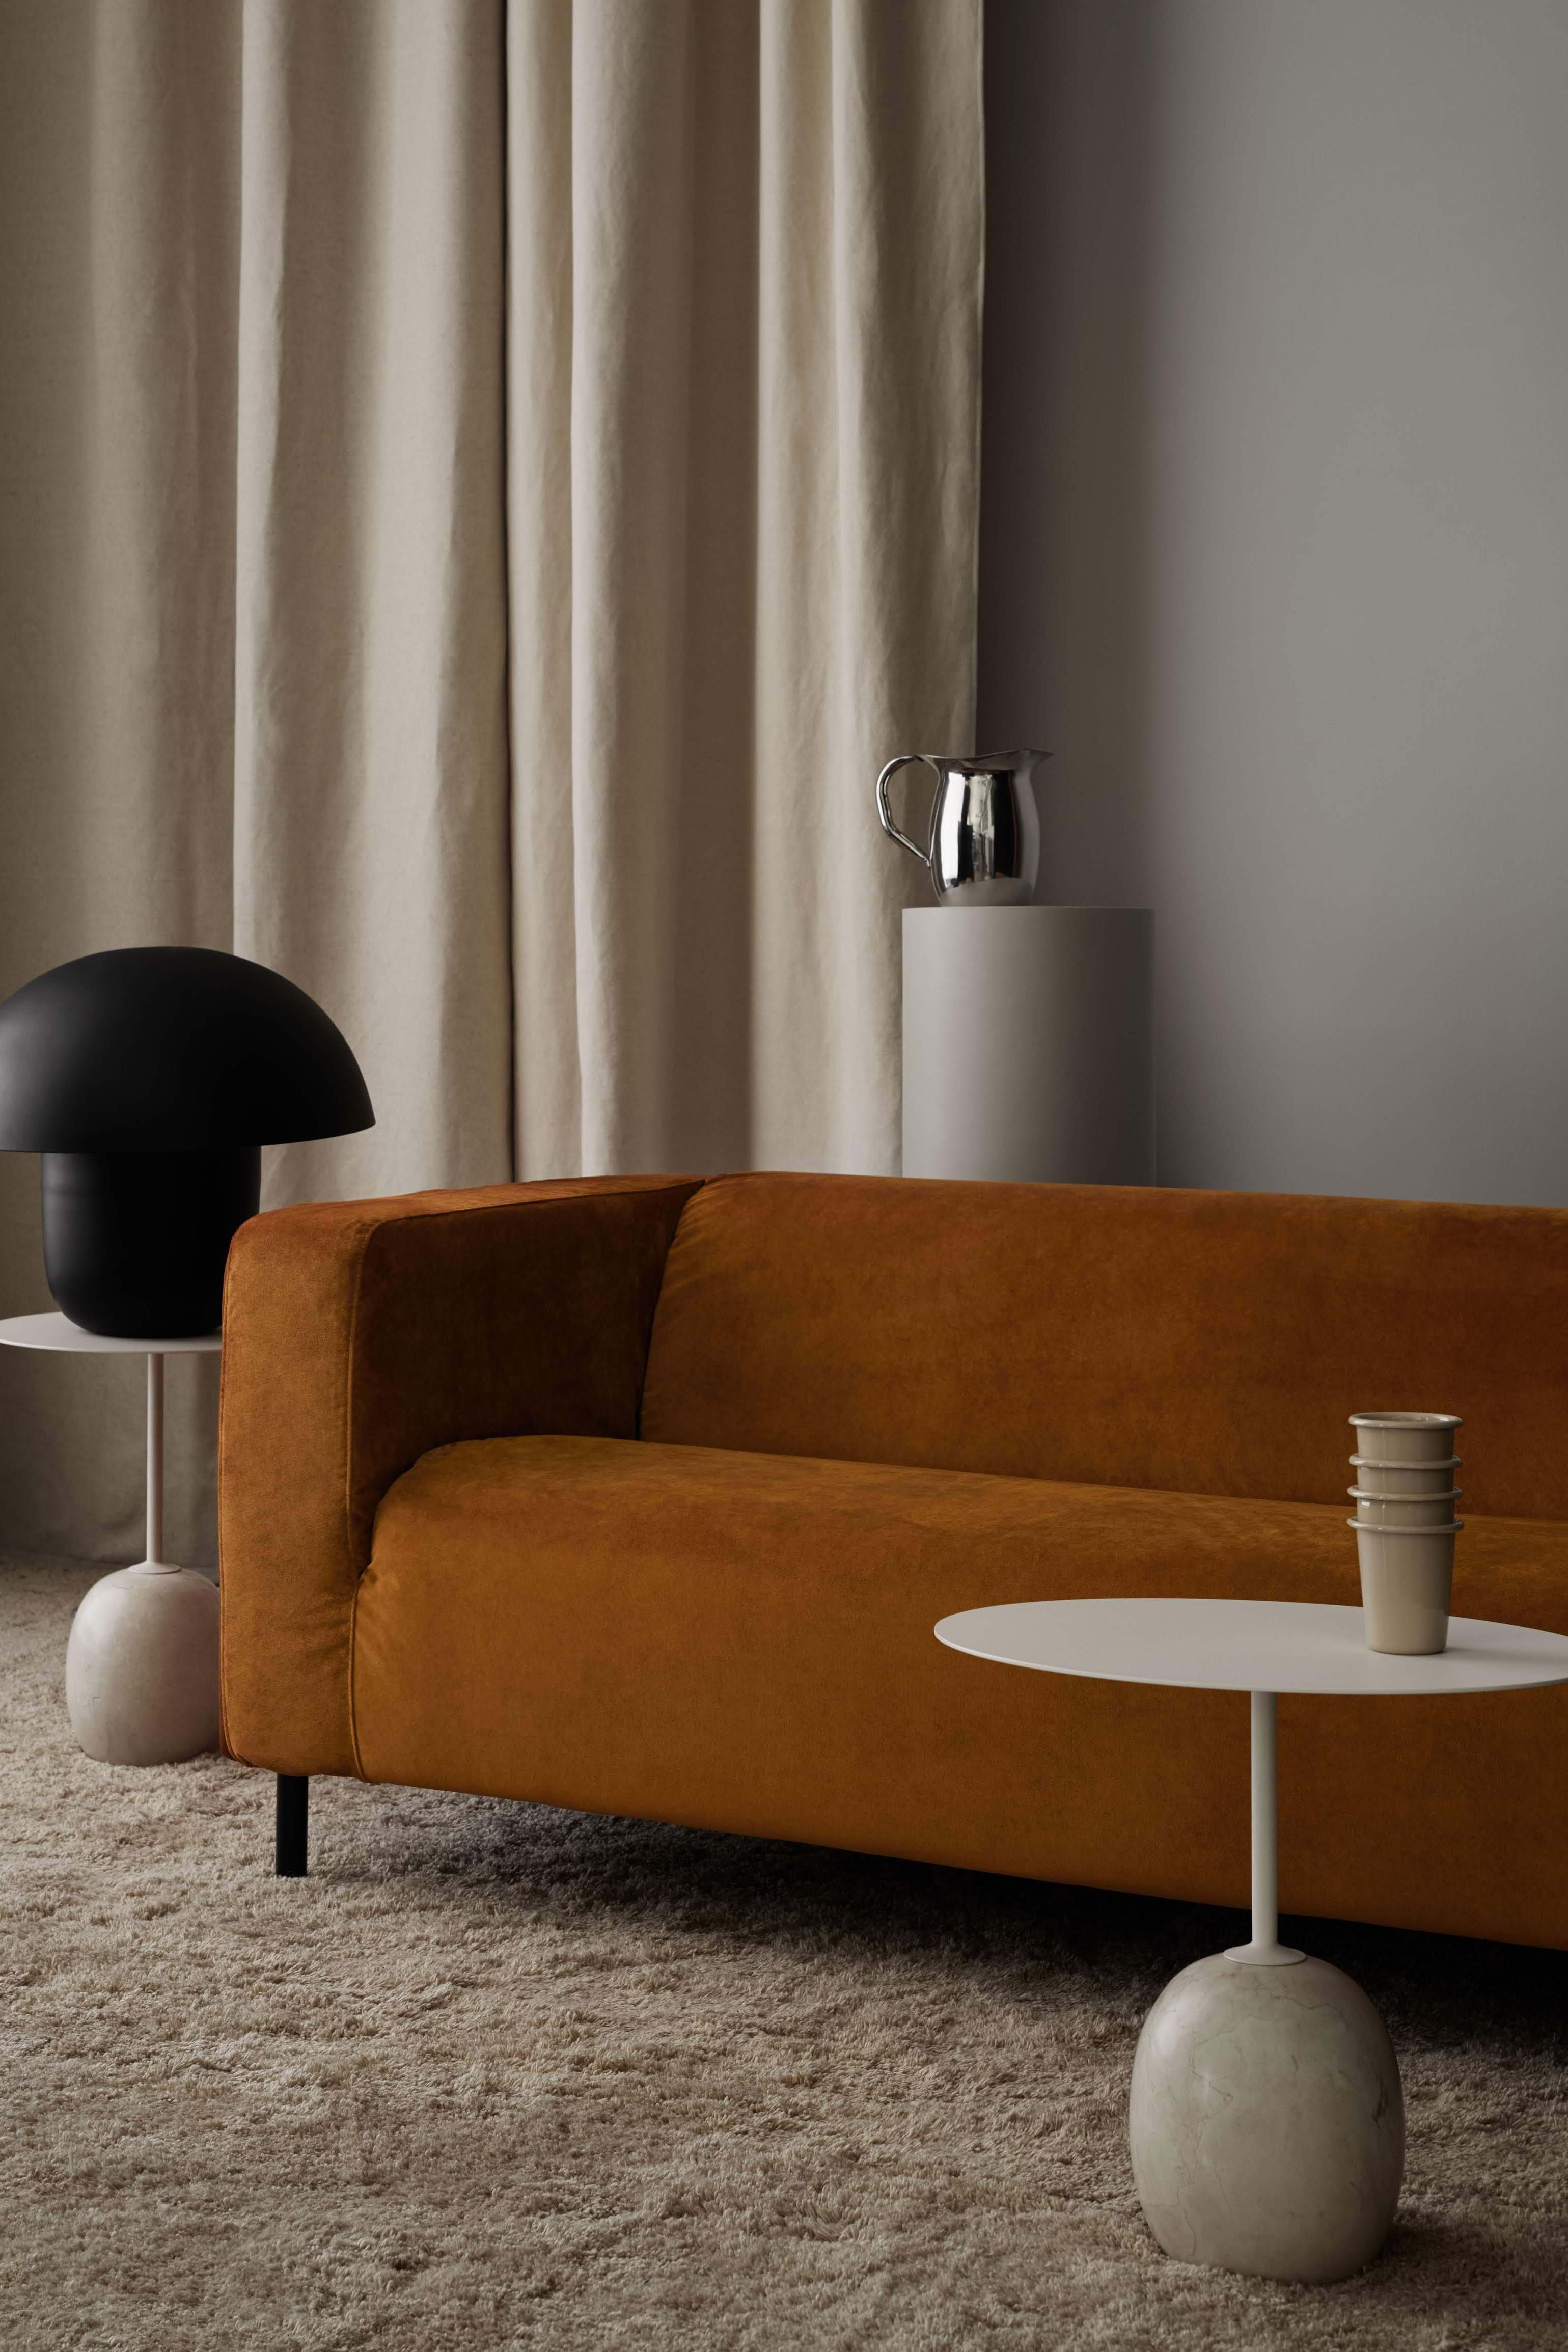 IKEA Klippan sofa review by Bemz Bemz